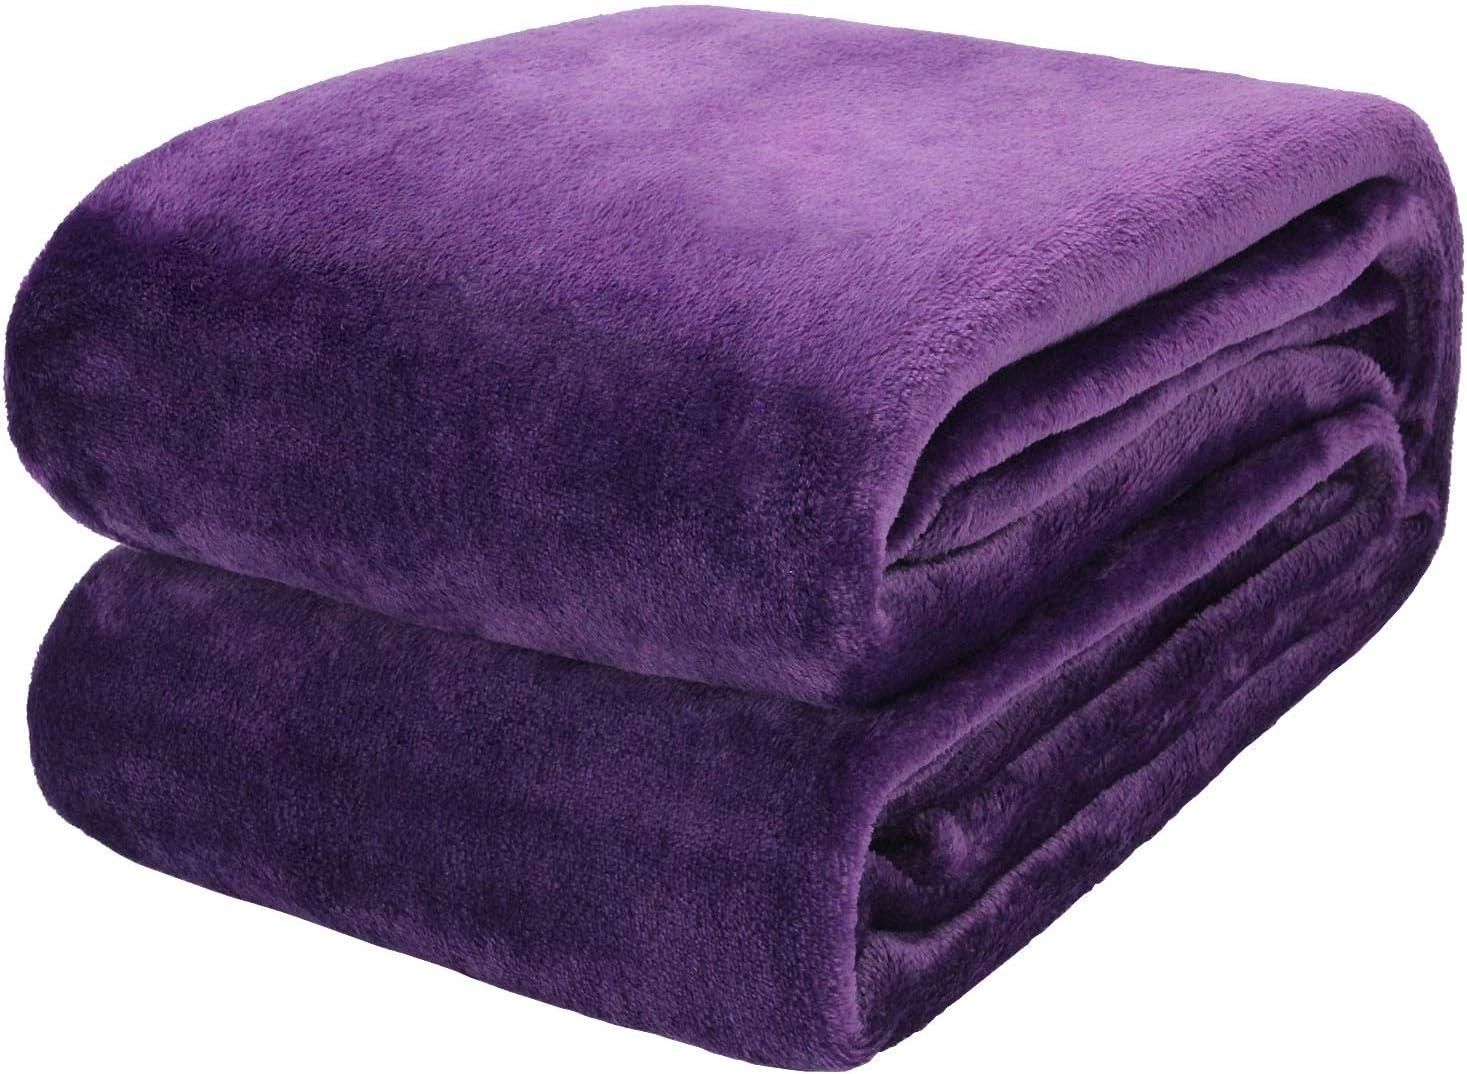 Flannel Fleece Blanket Throw Blanket,Fluff Purple Home Deep Tulsa Mall Popular standard